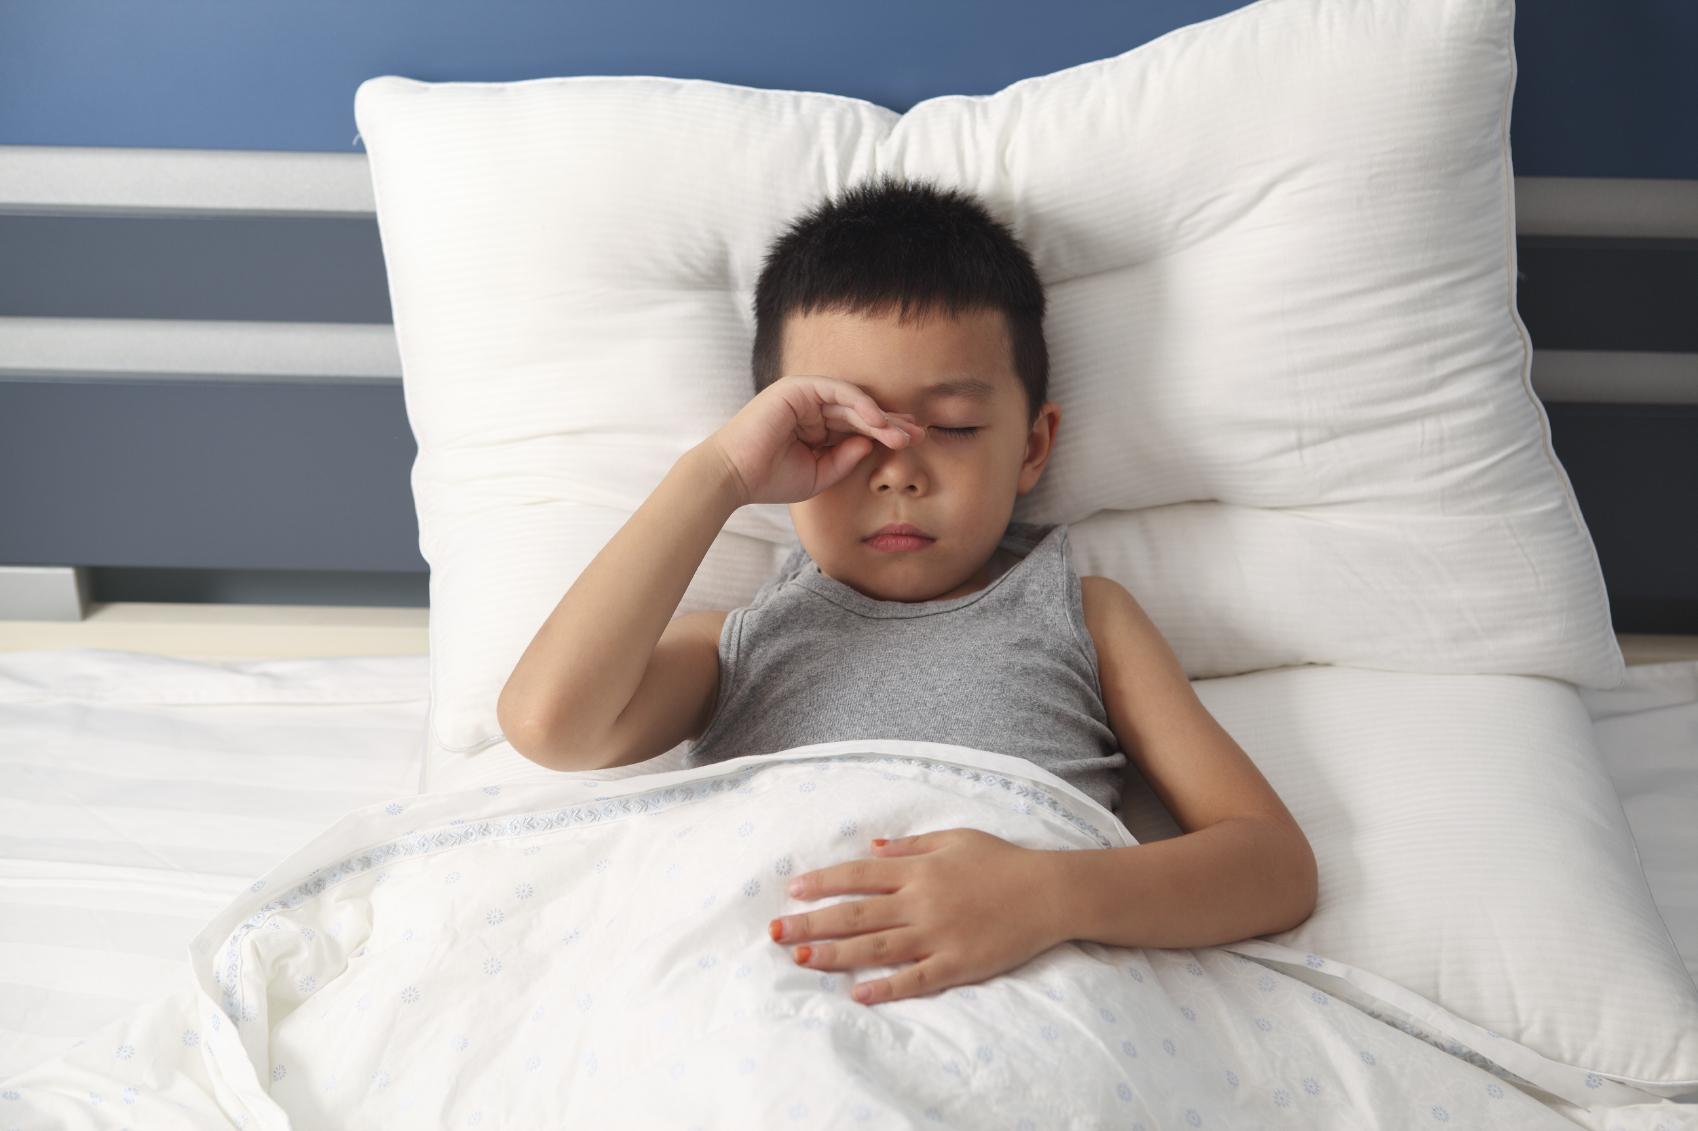 Sleep problems affect many children with eczema